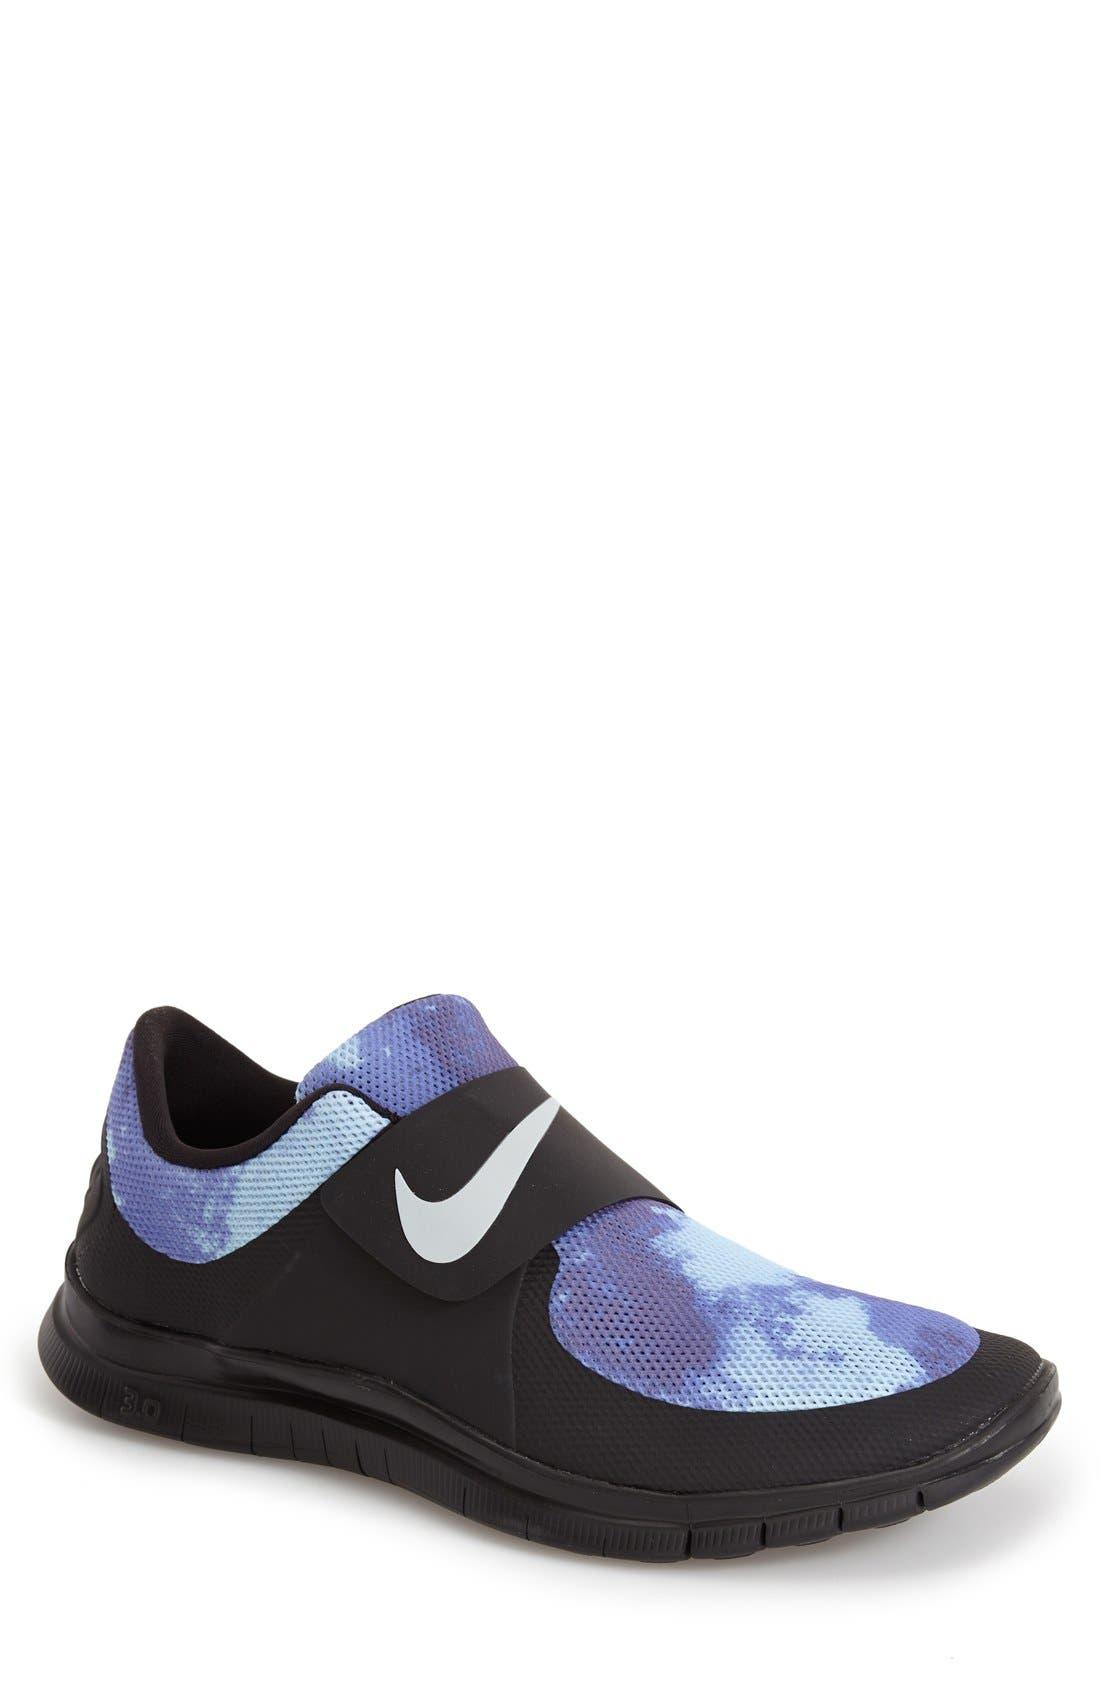 NIKE,                             'Free Socfly SD' Sneaker,                             Main thumbnail 1, color,                             004